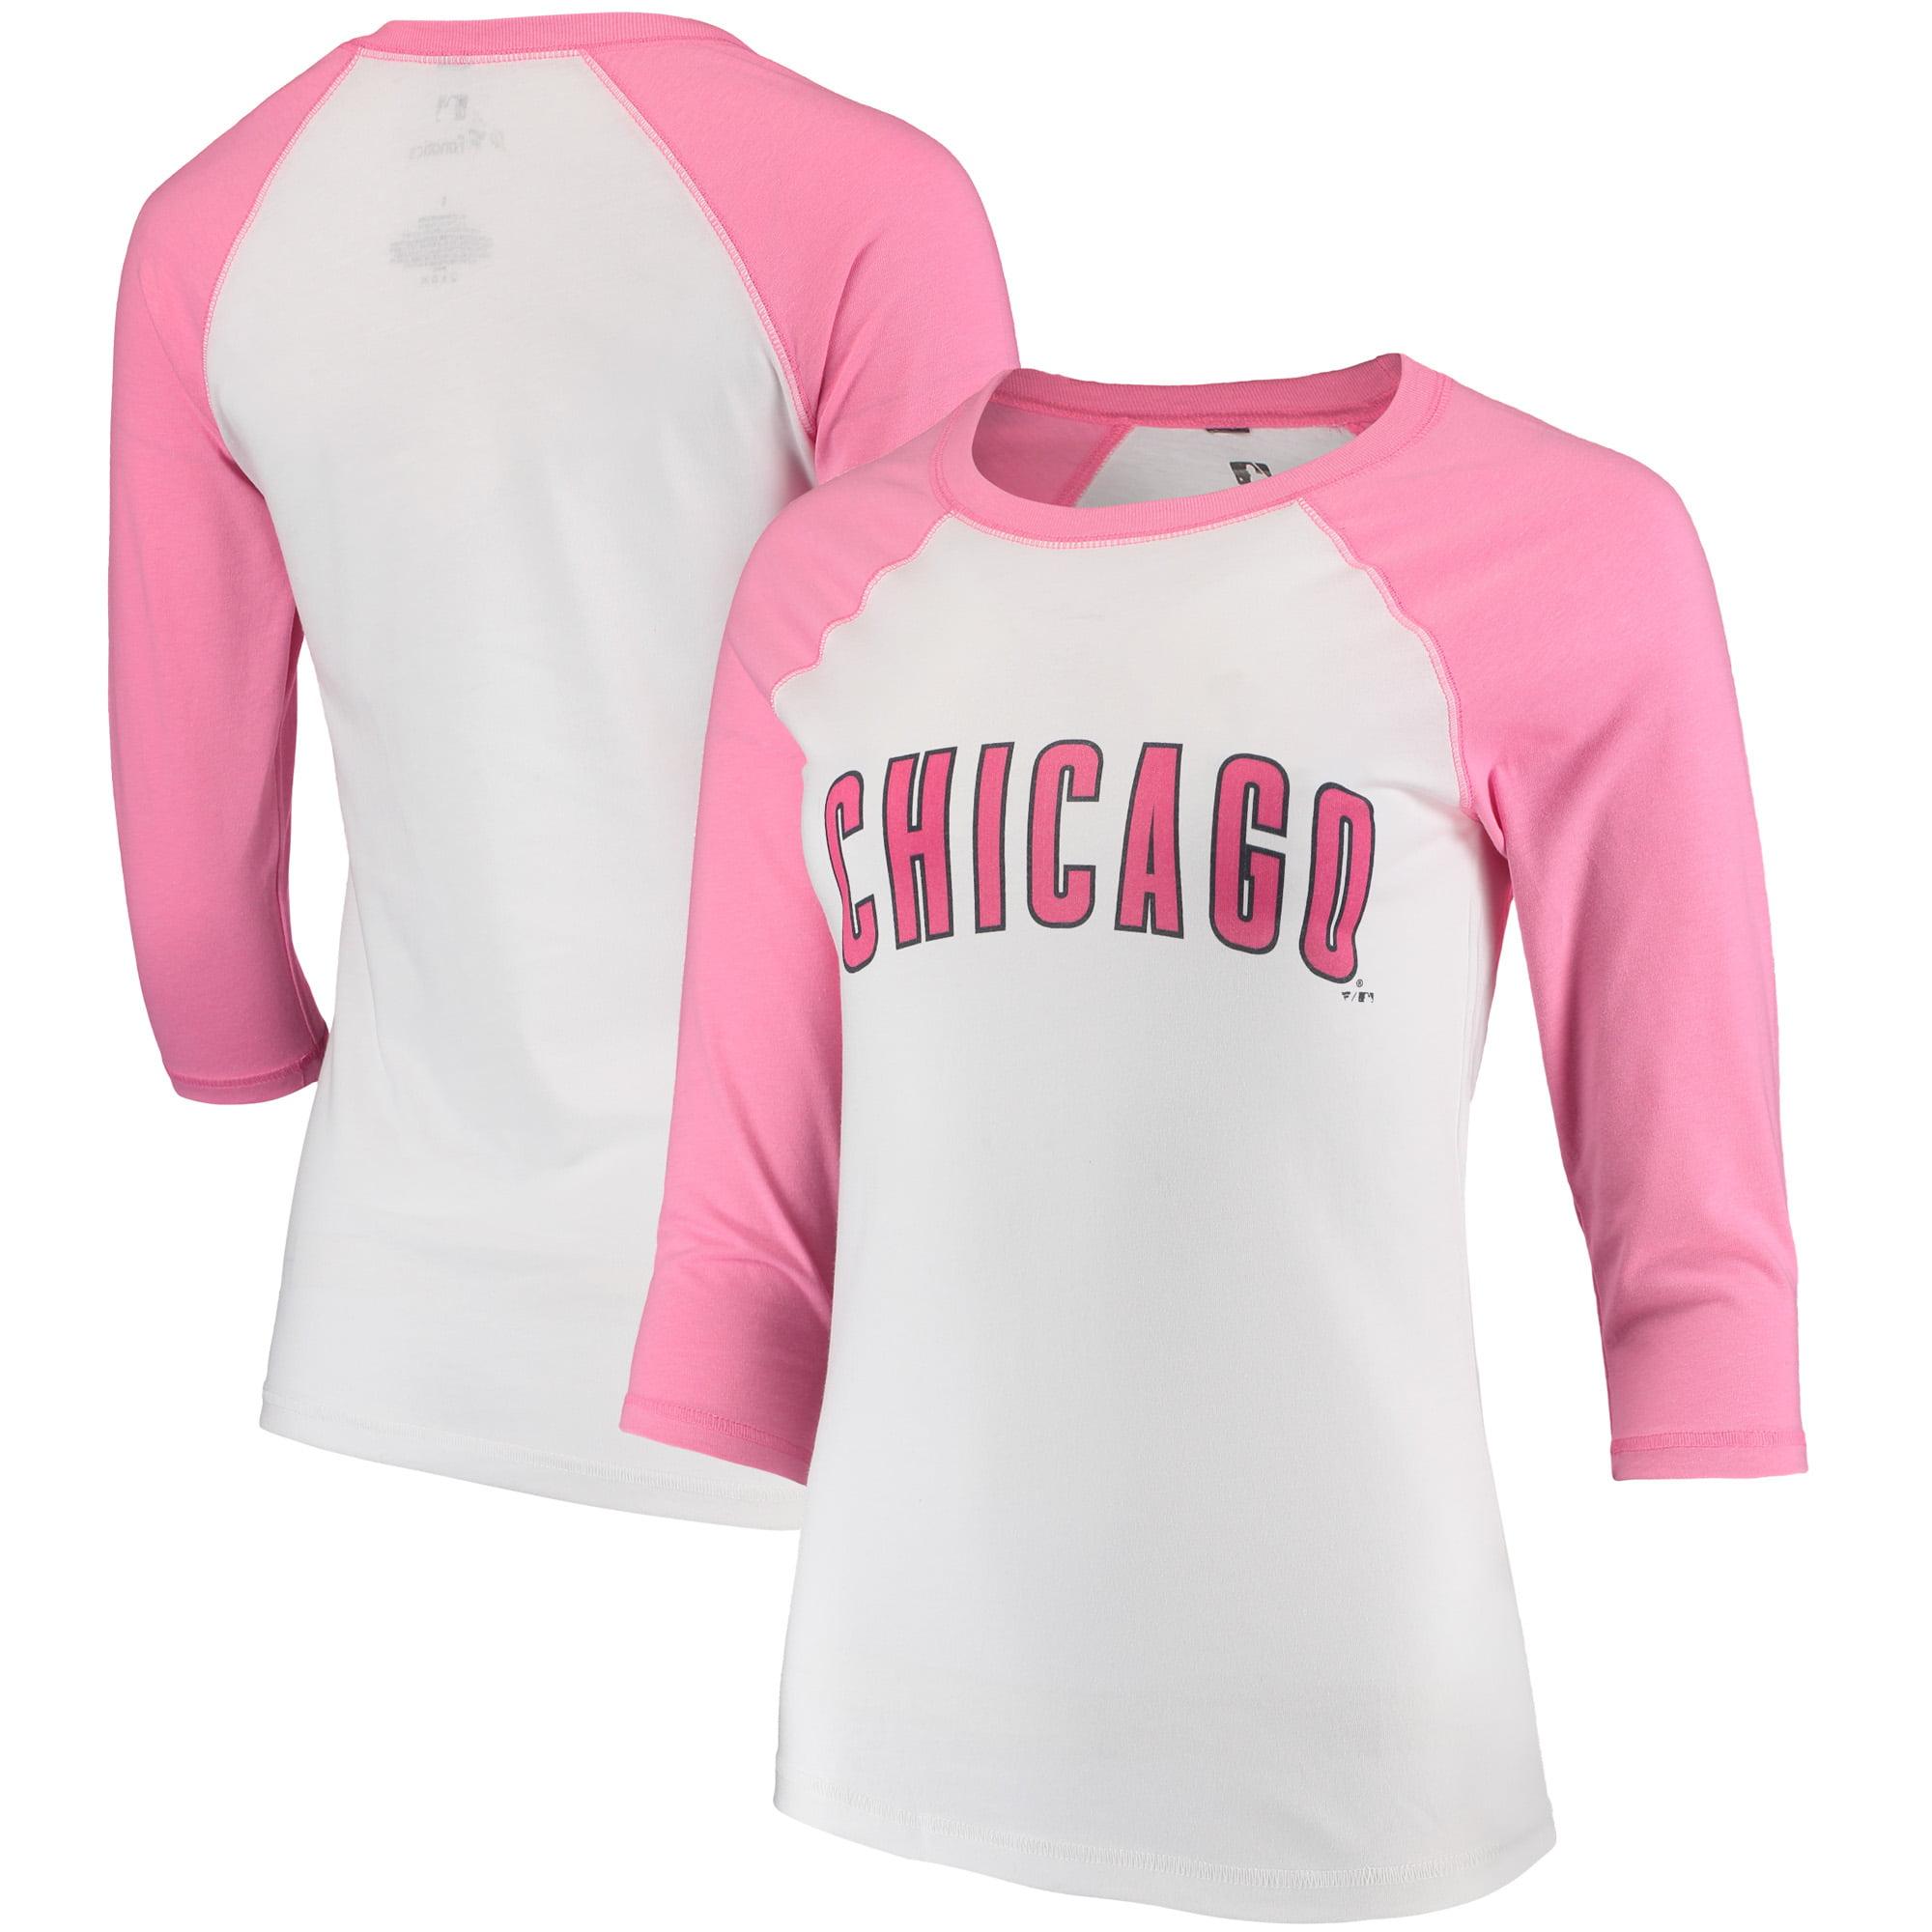 Women's Fanatics Branded White Chicago Cubs Pink Wordmark 3/4-Sleeve Raglan T-Shirt